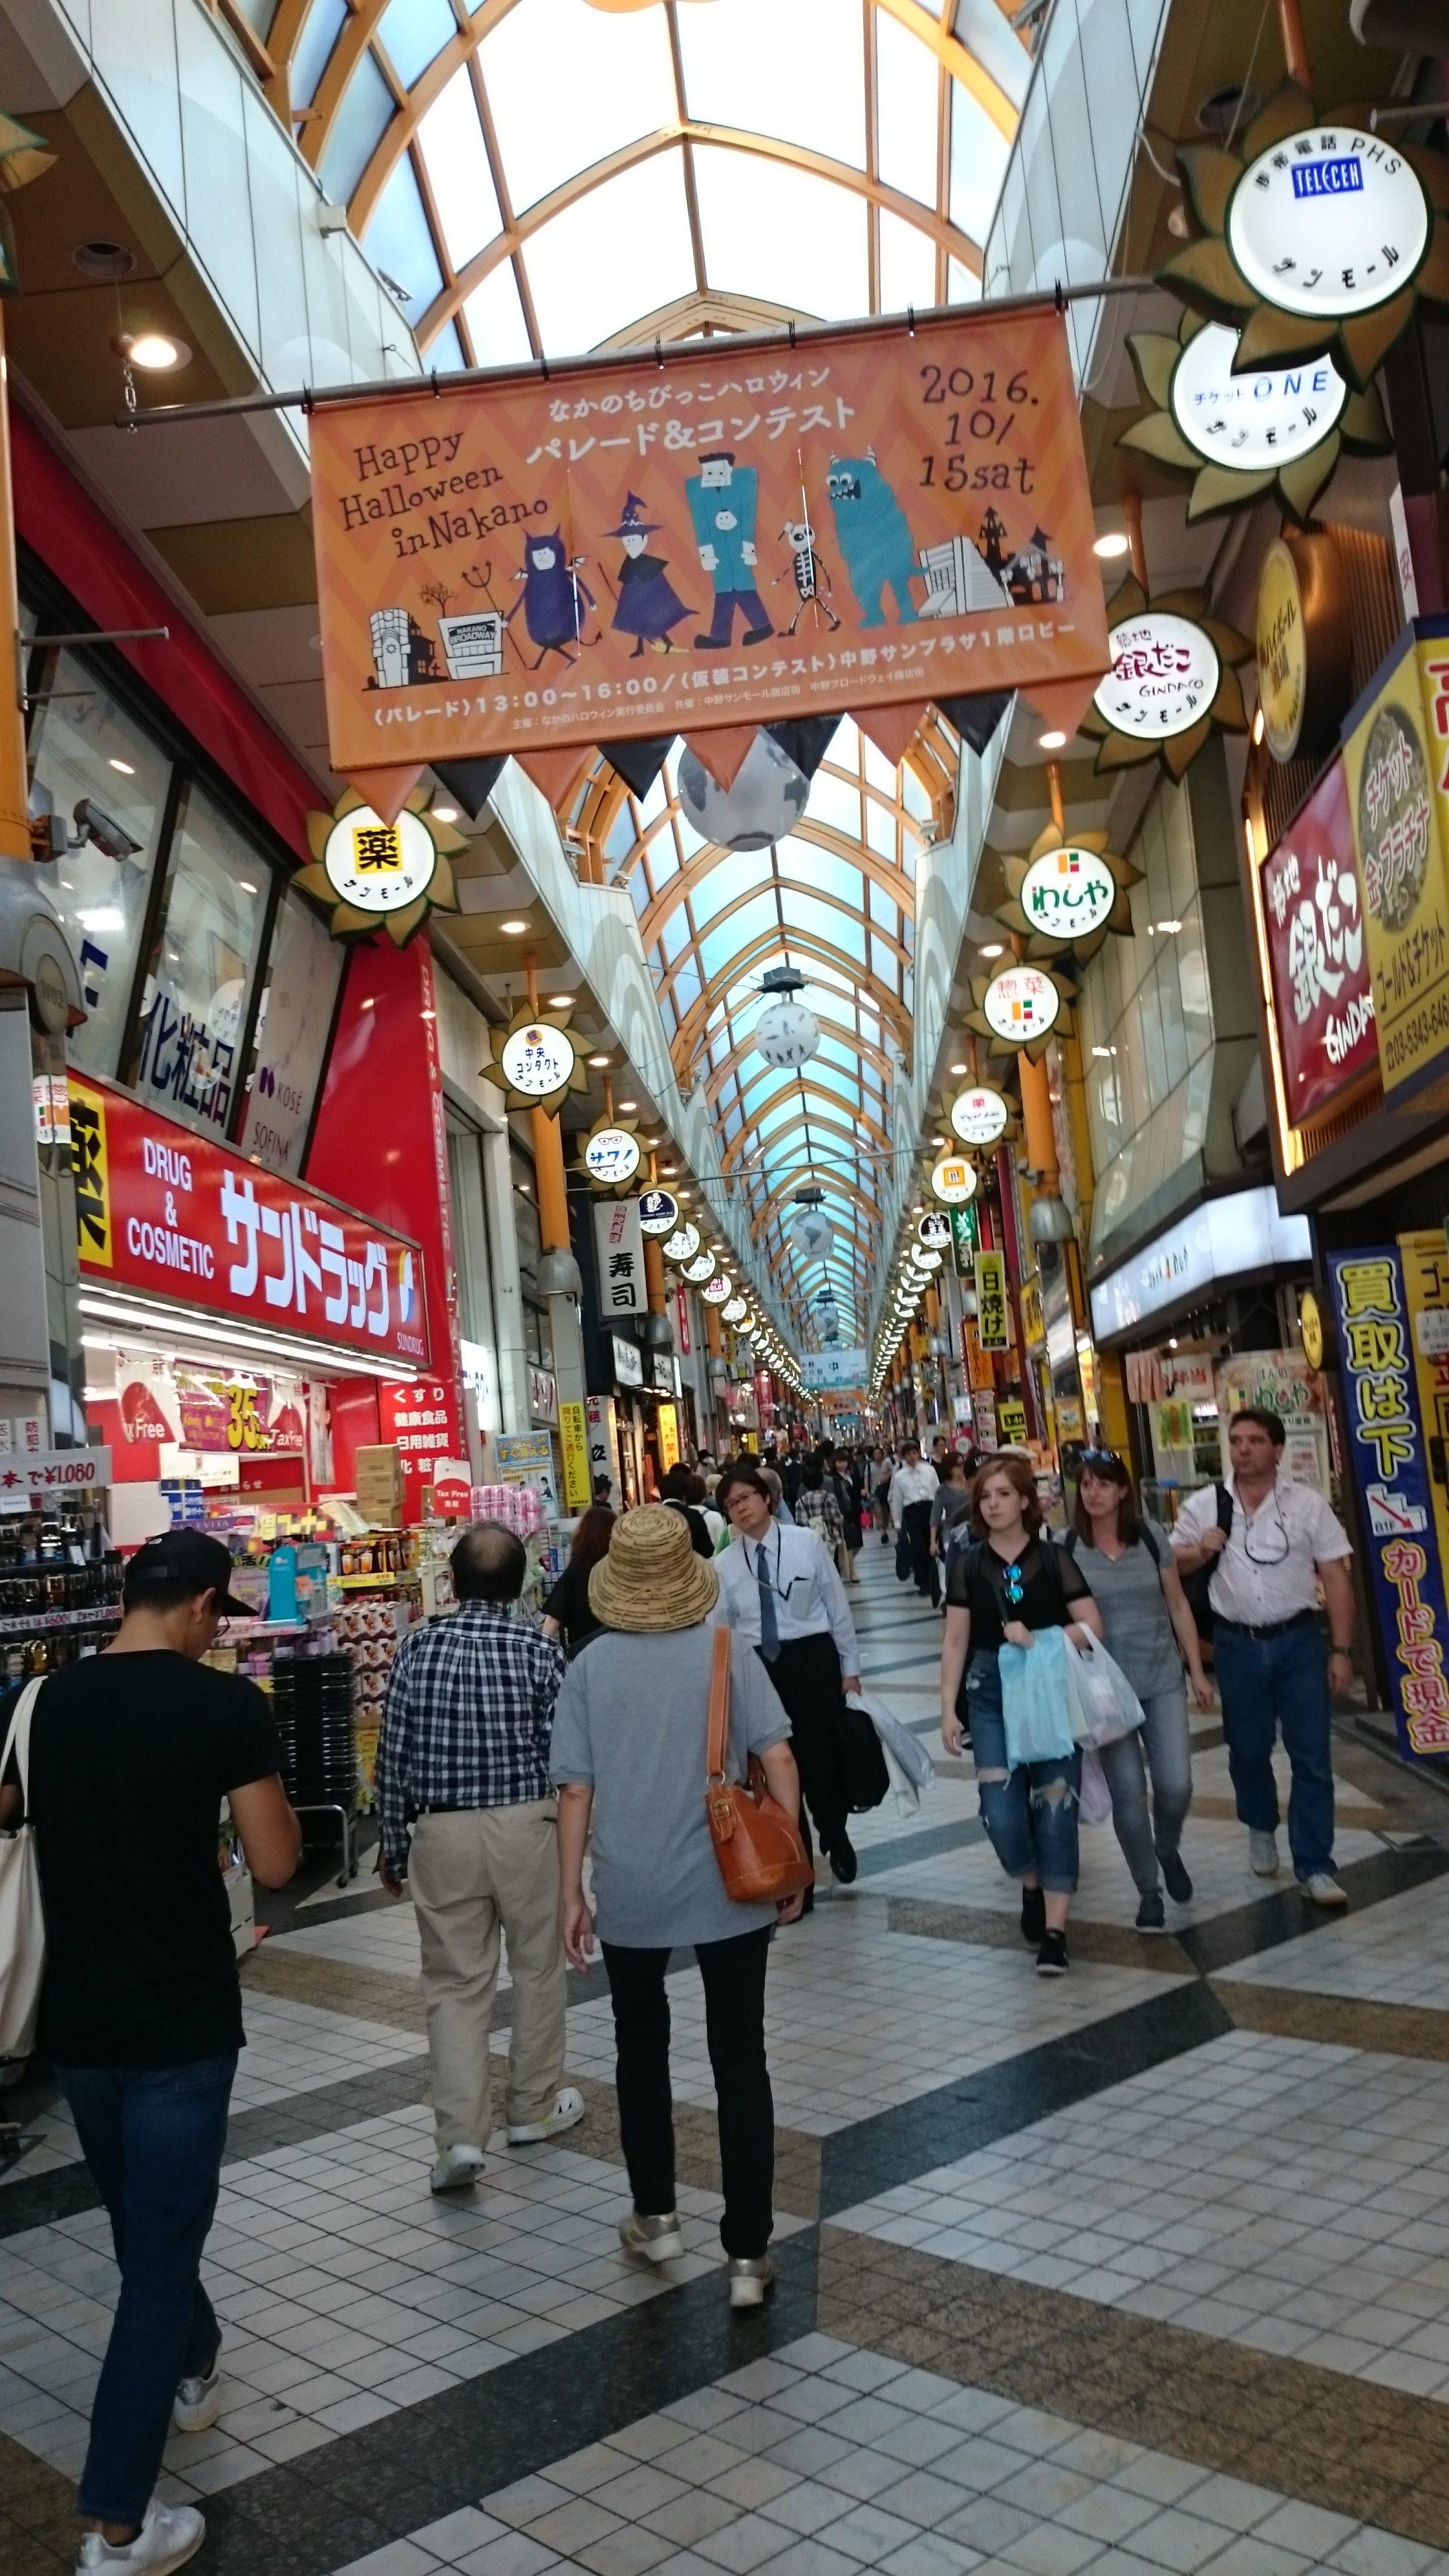 Galerie marchande à Nakano, Japon